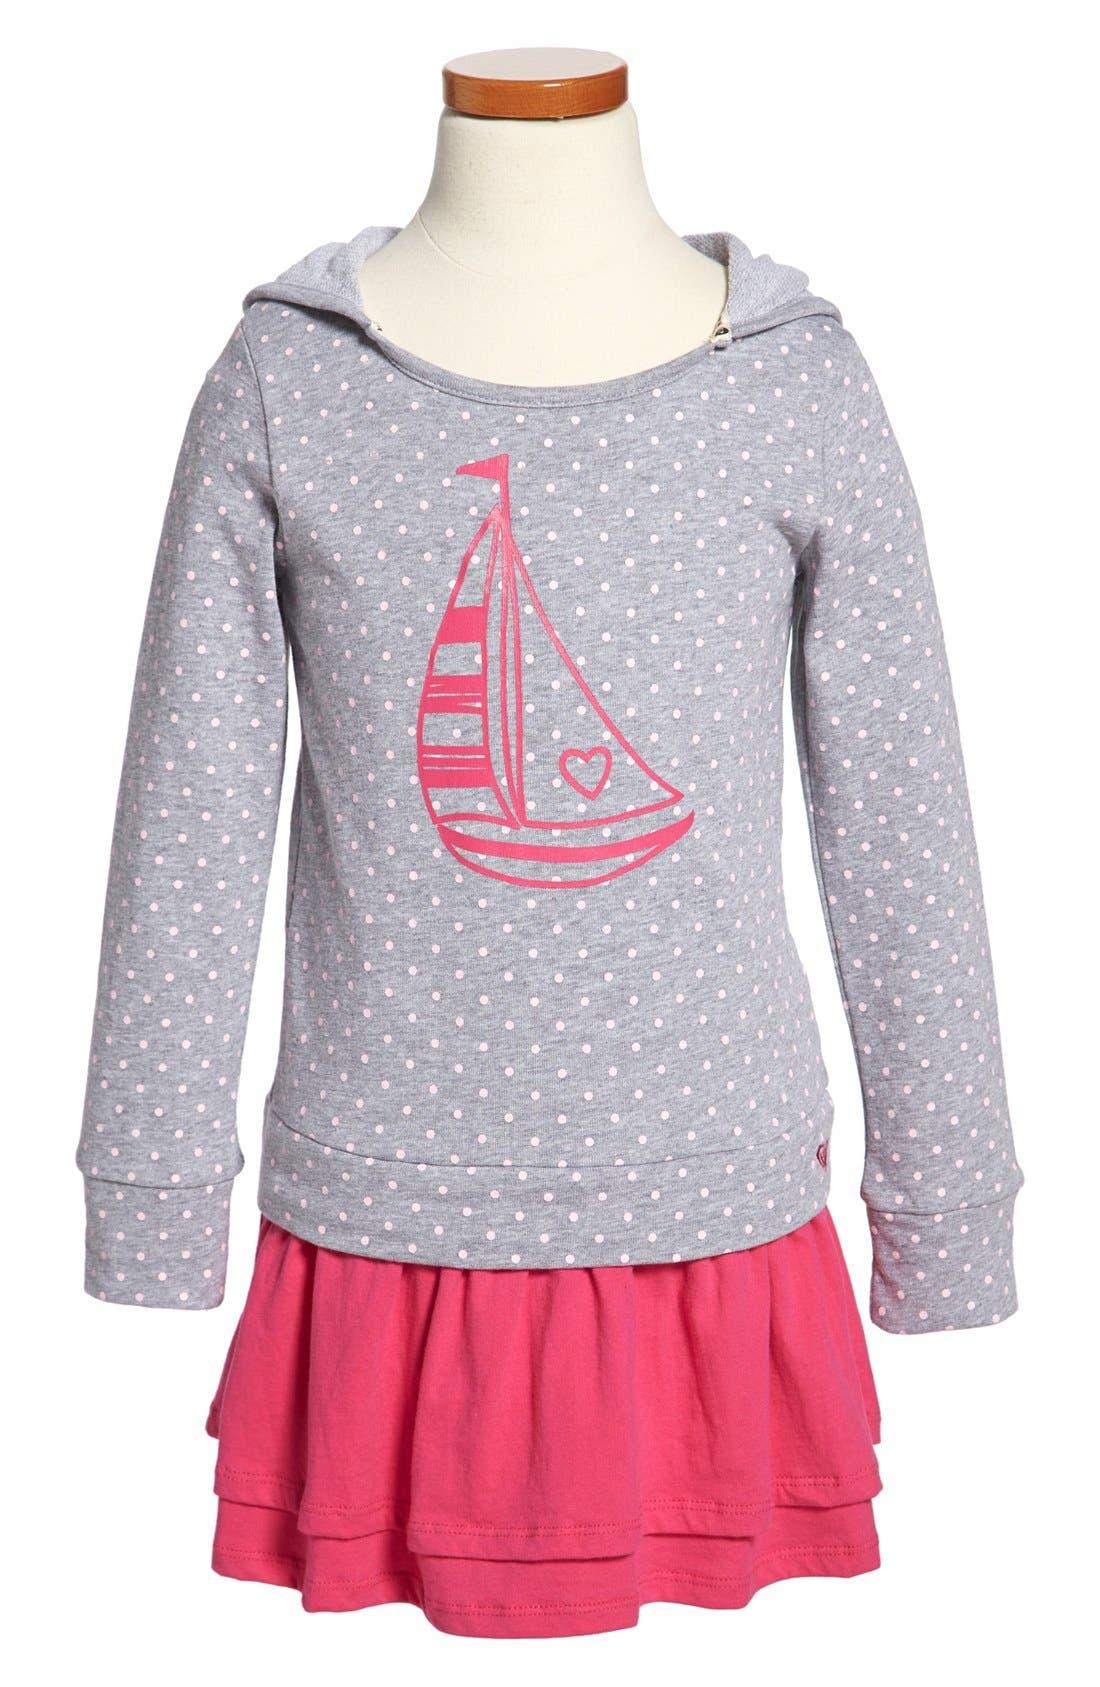 Main Image - Roxy 'West Port' Hooded Dress (Little Girls & Big Girls)